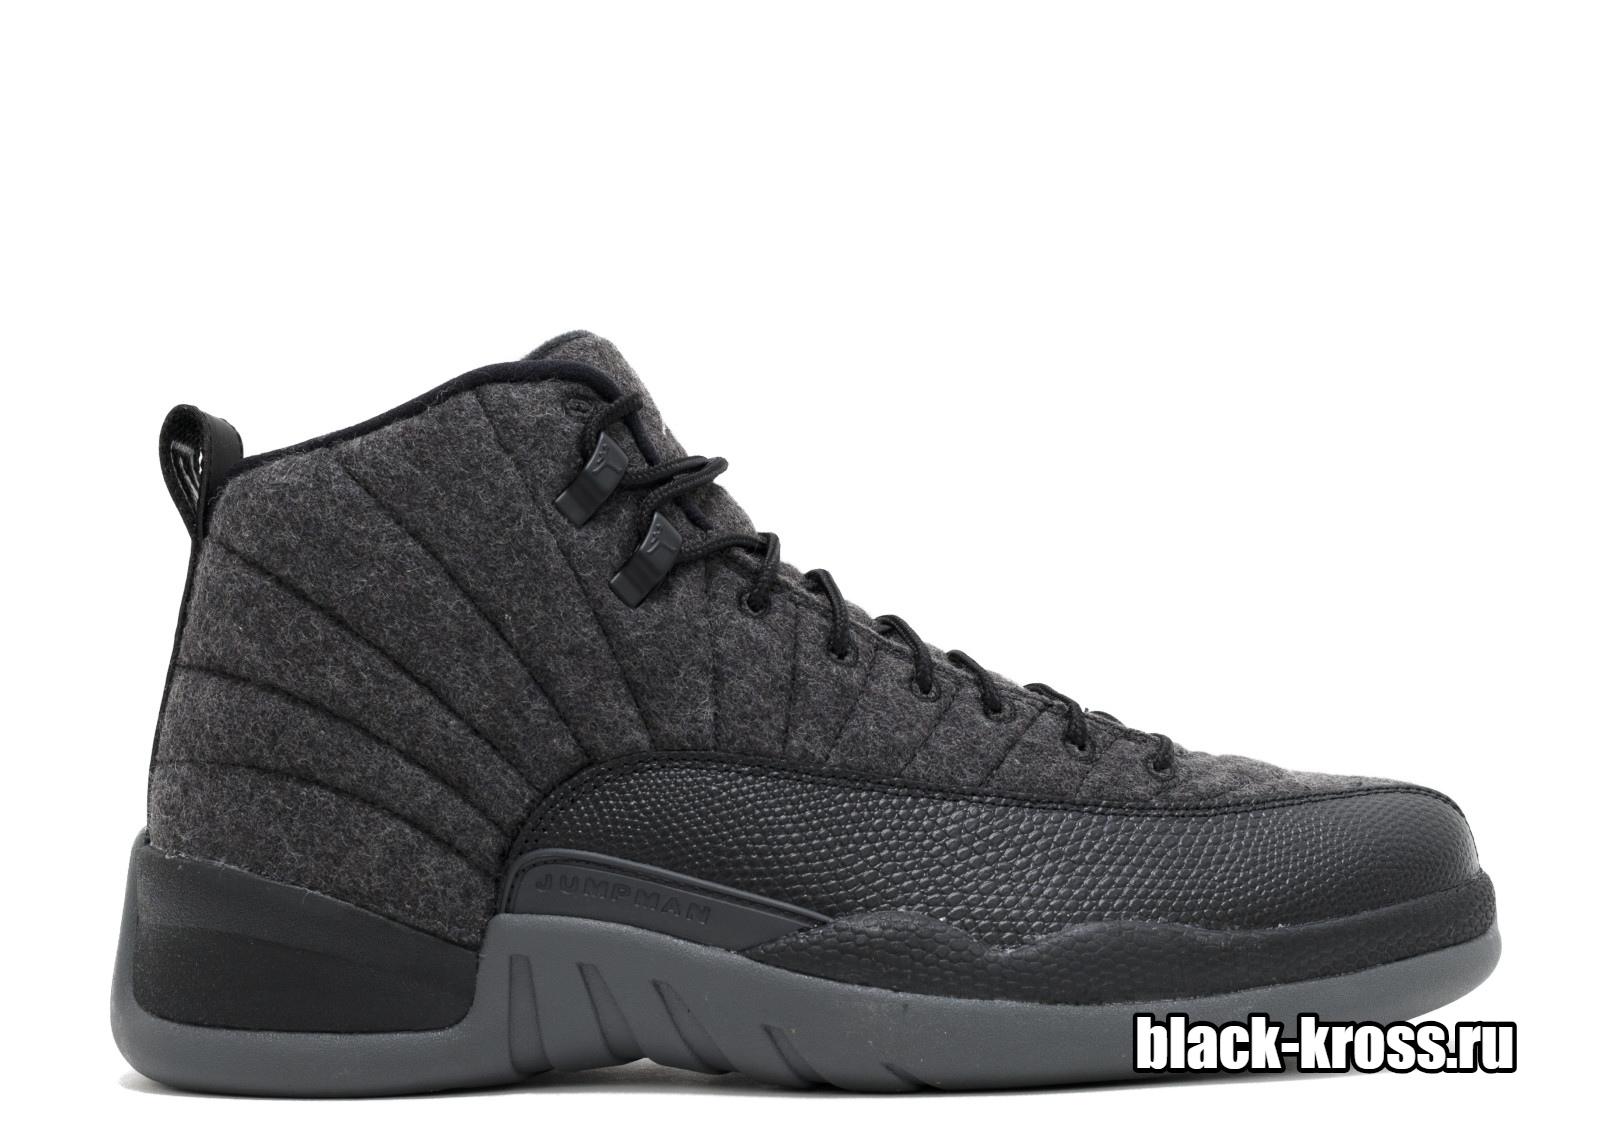 NIKE AIR JORDAN 12 RETRO Grey & Black (41-46)